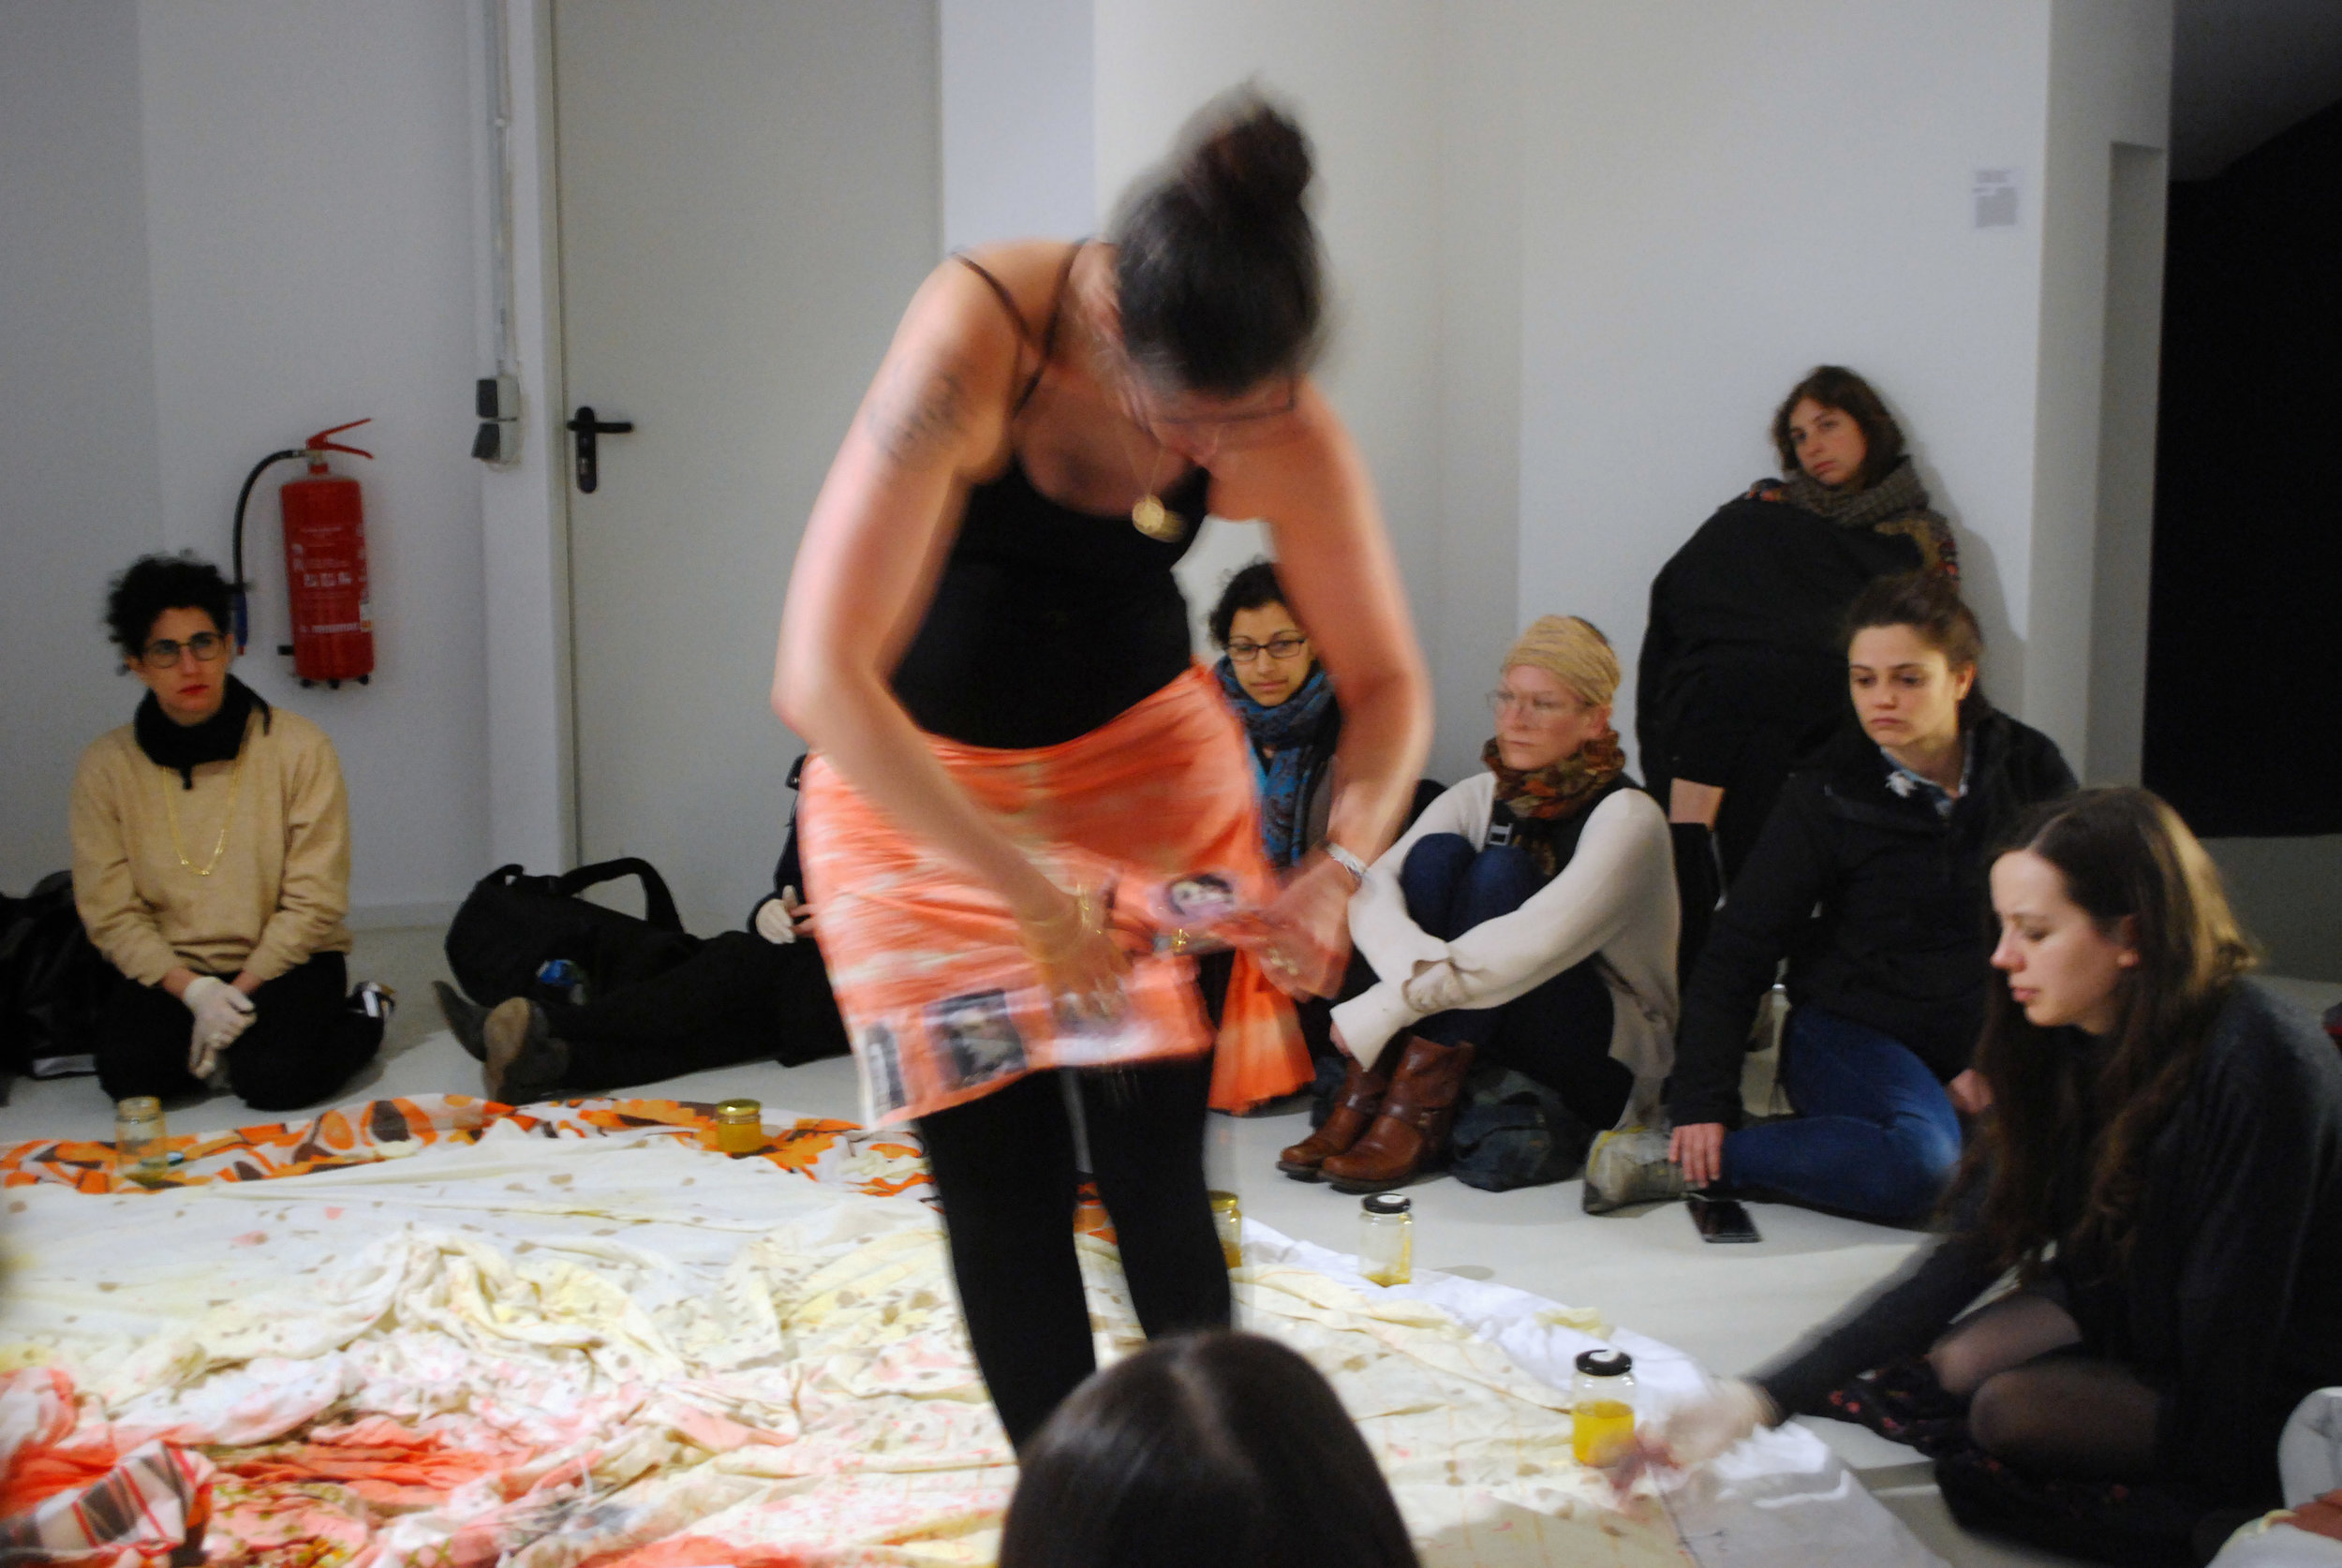 The Fluid Body on an Uneven Political Ground / Adi Liraz